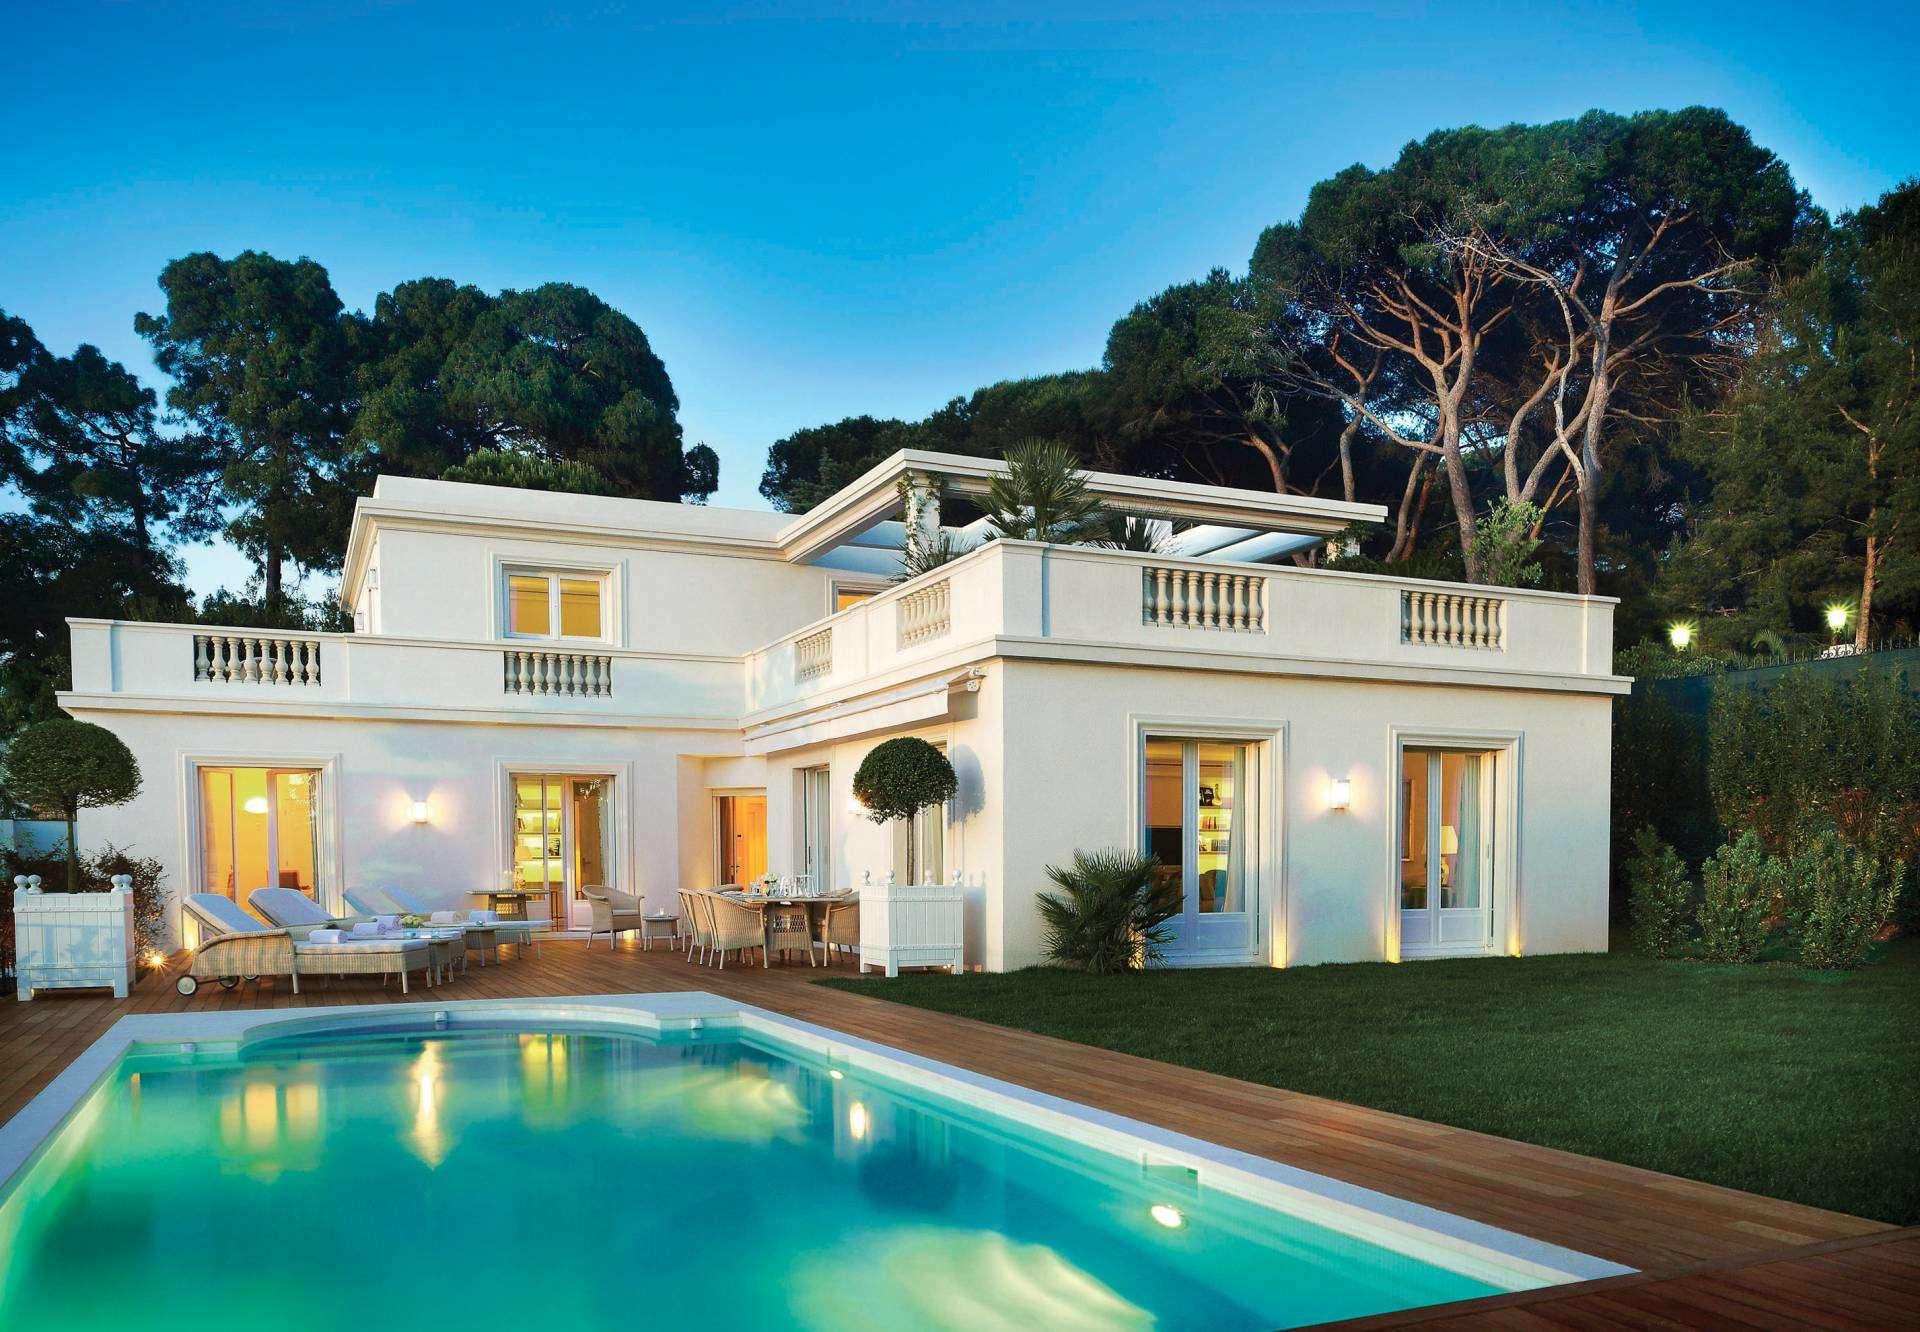 Luxury vacation rentals europe - France - Frenchriviera - Antibes - Villa Cap 1 - Image 1/9